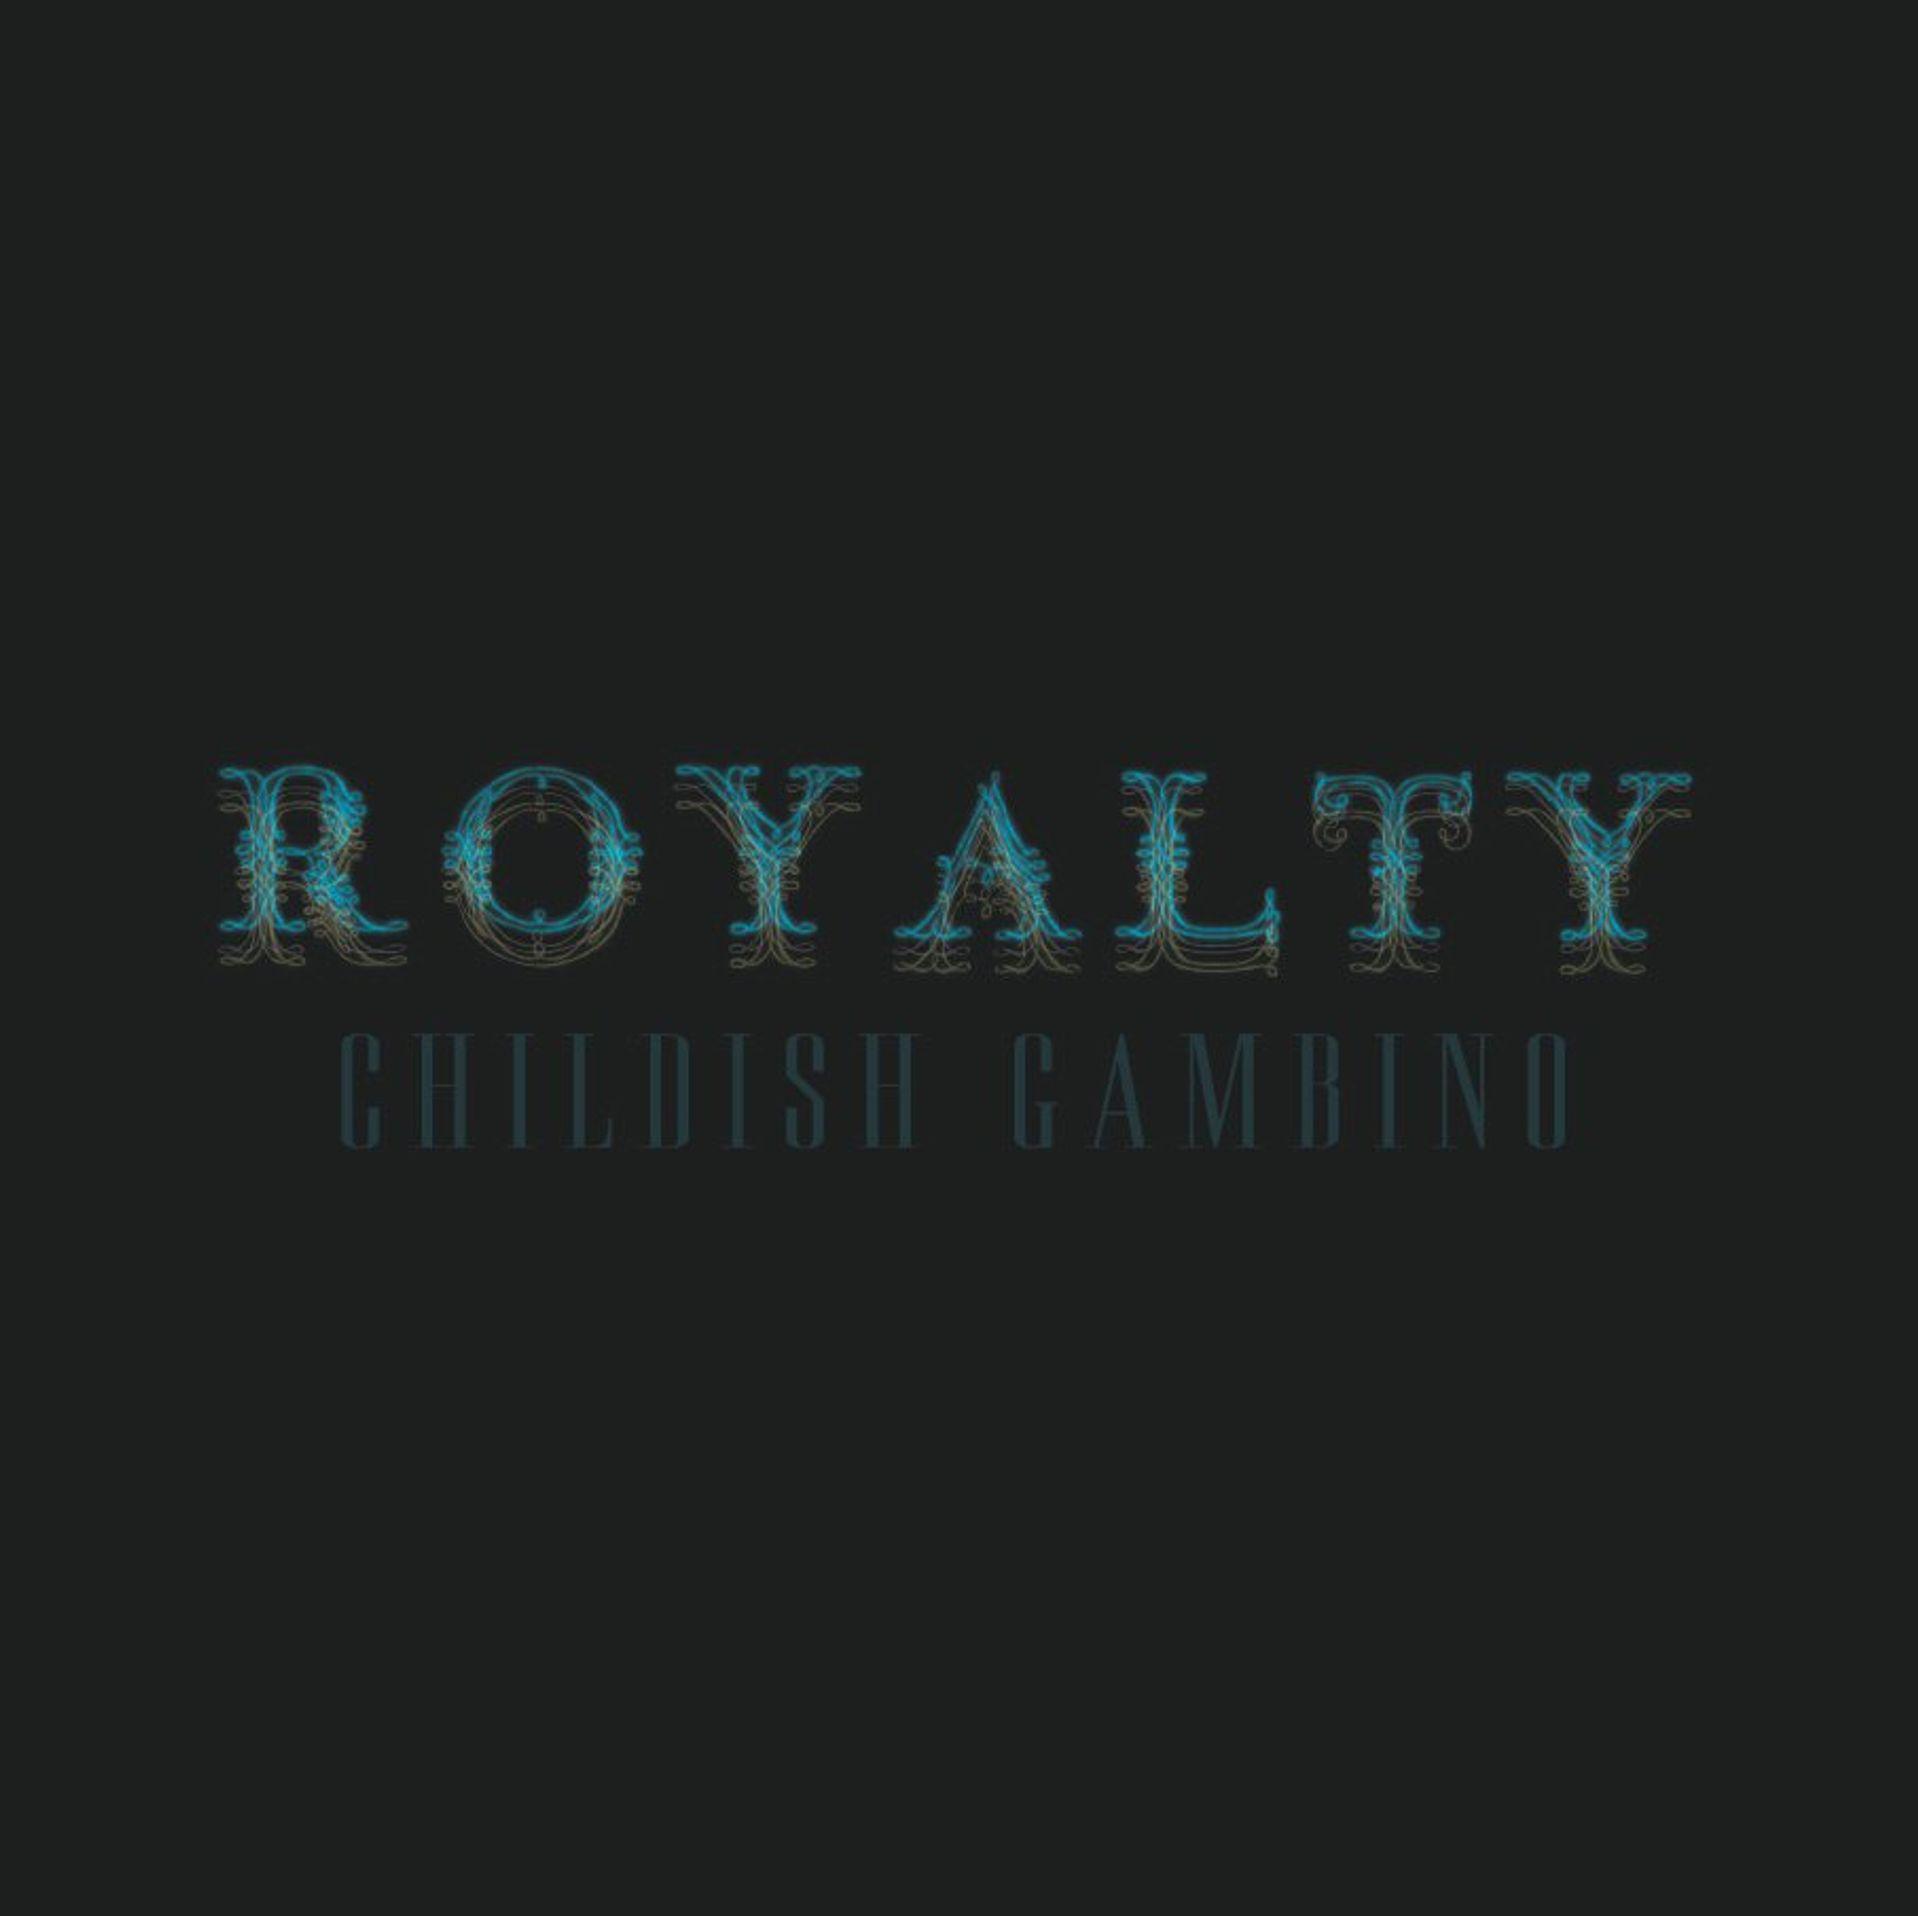 Album Title: Royalty by: Childish Gambino